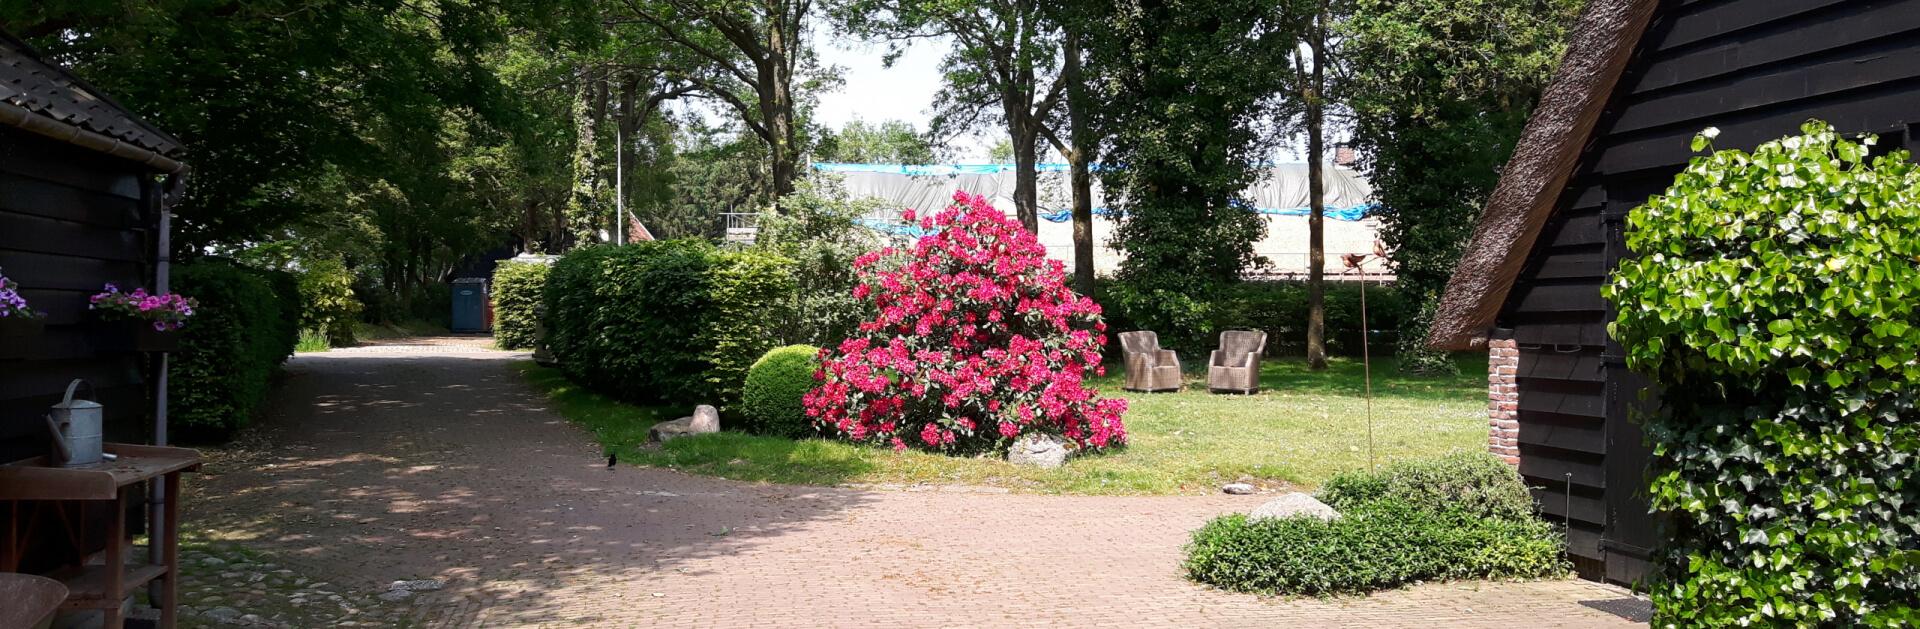 Het Eursingerhof Achtertuin